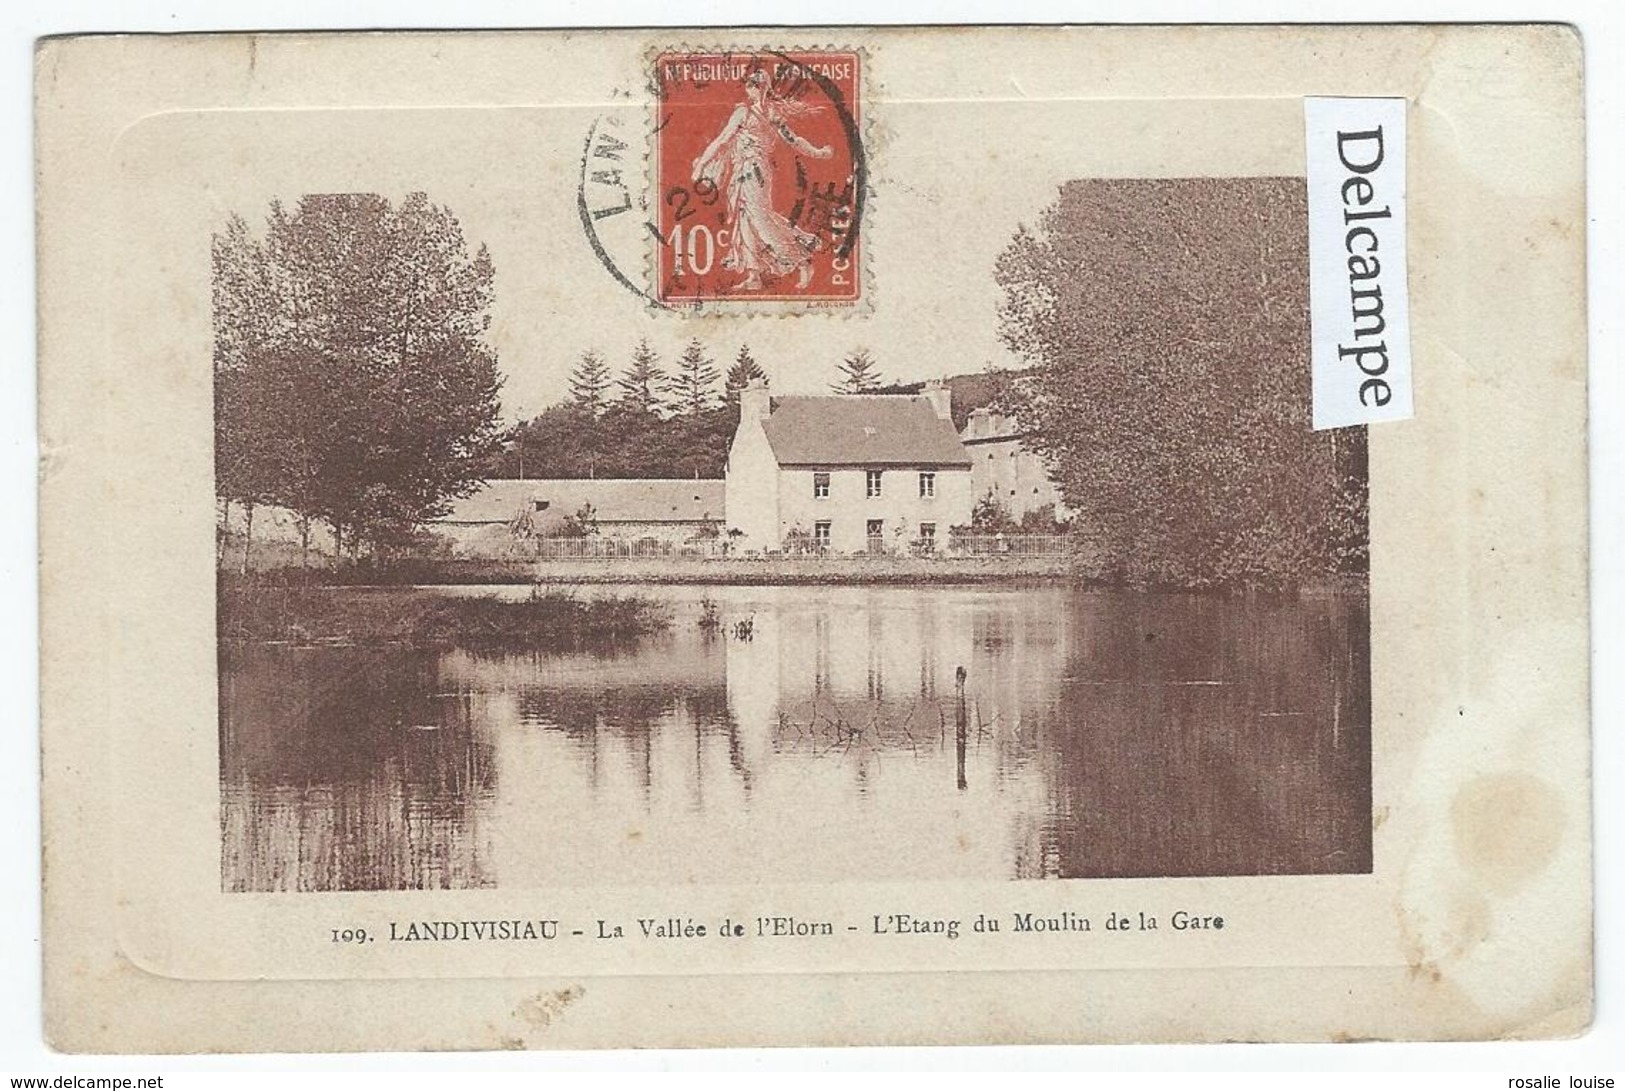 LANDIVISIAU (29) - La Vallée De L'elorn - L'Etang Du Moulin De La Gare - Landivisiau